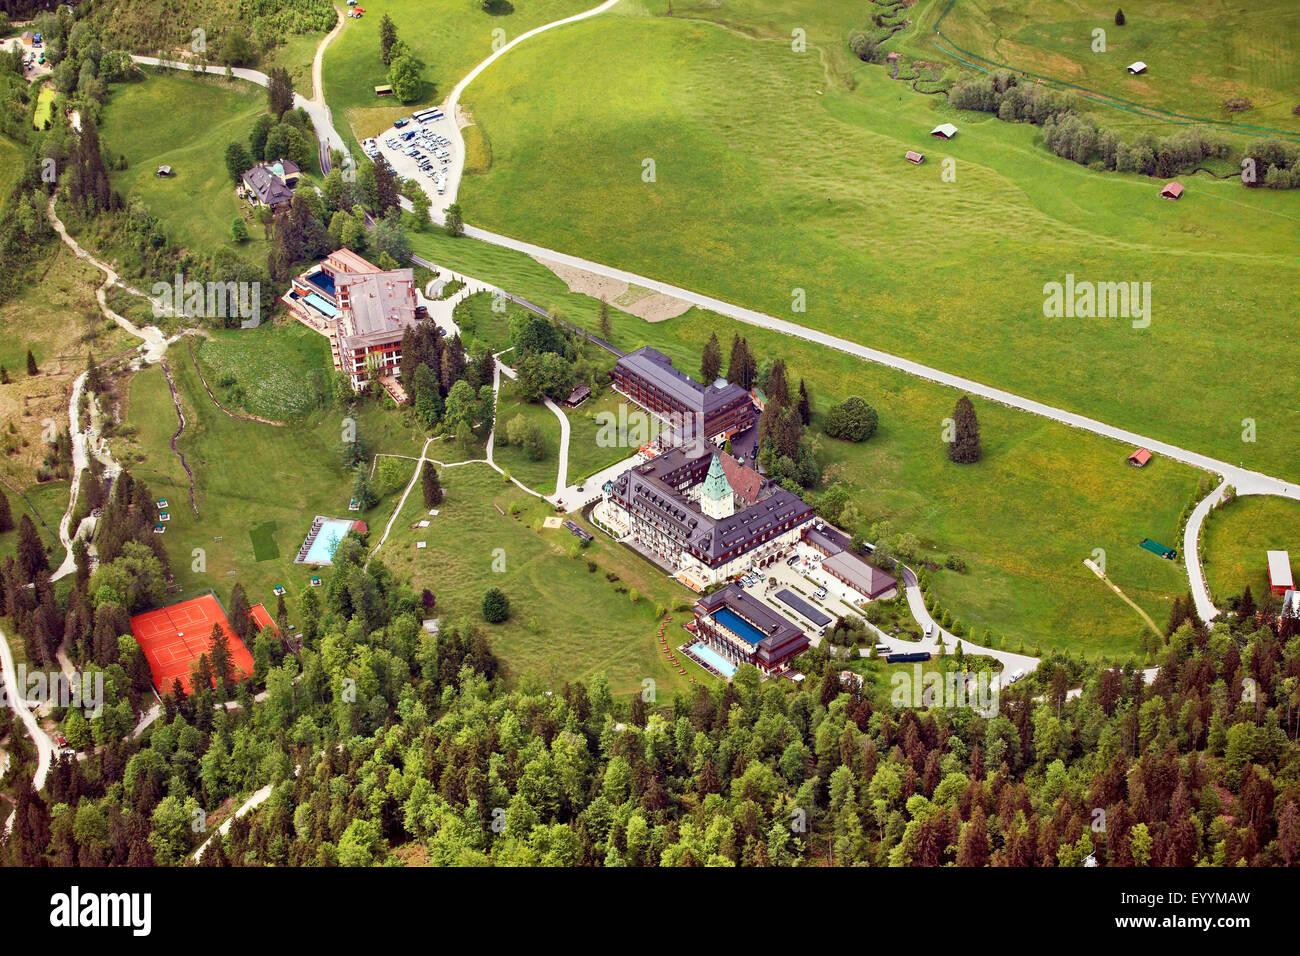 aerial view to Schloss Elmau, 41st G7 summit 2015, 01.06.2015, Germany, Bavaria, Oberbayern, Upper Bavaria, Klais - Stock Image